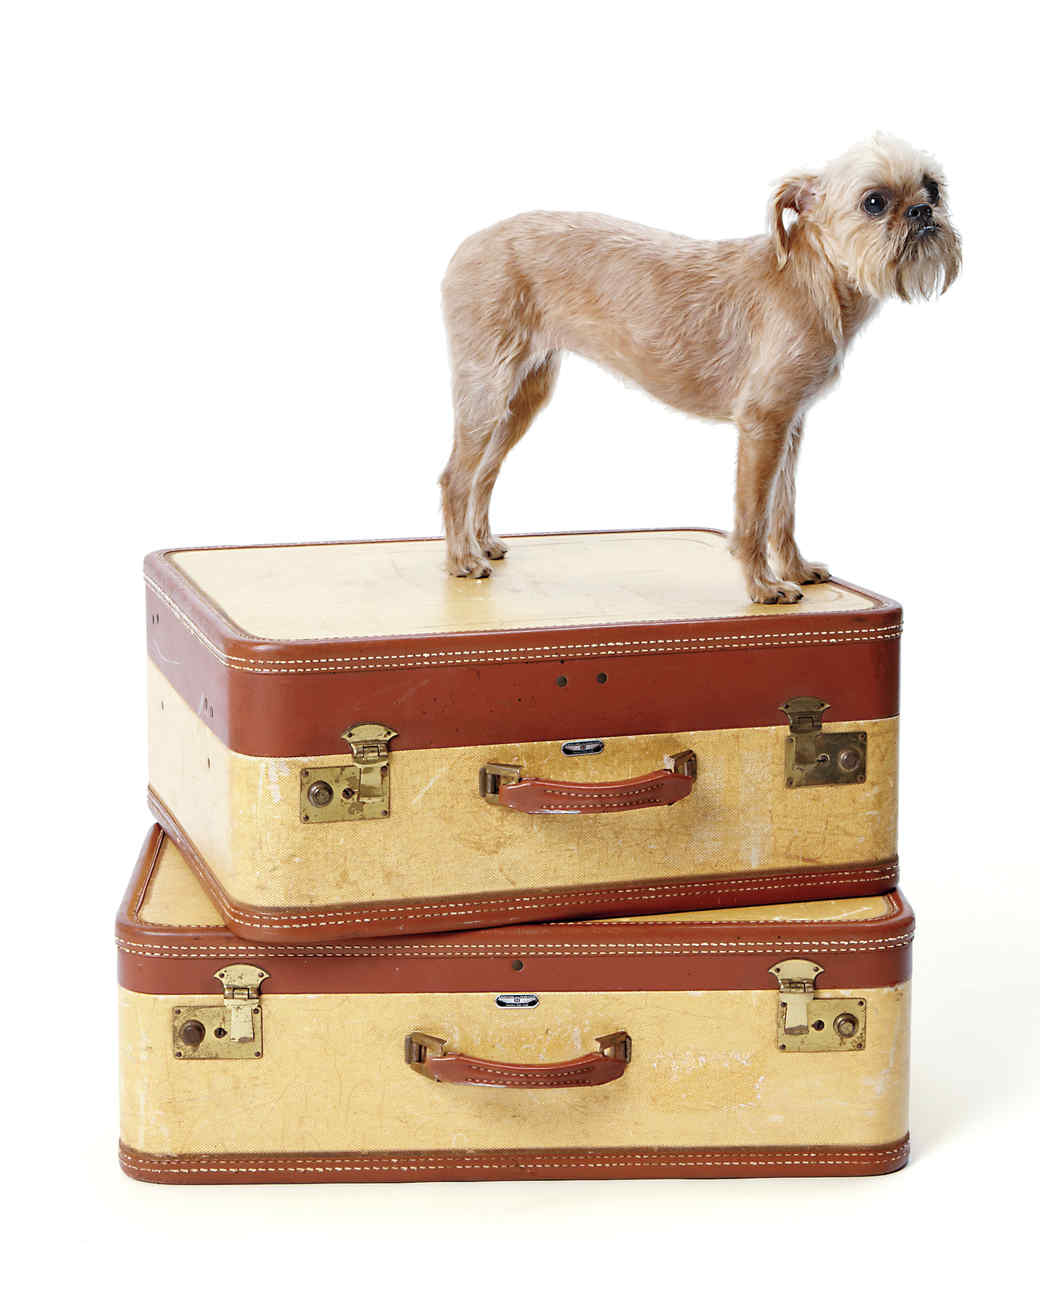 travel-pets-192-md109721.jpg